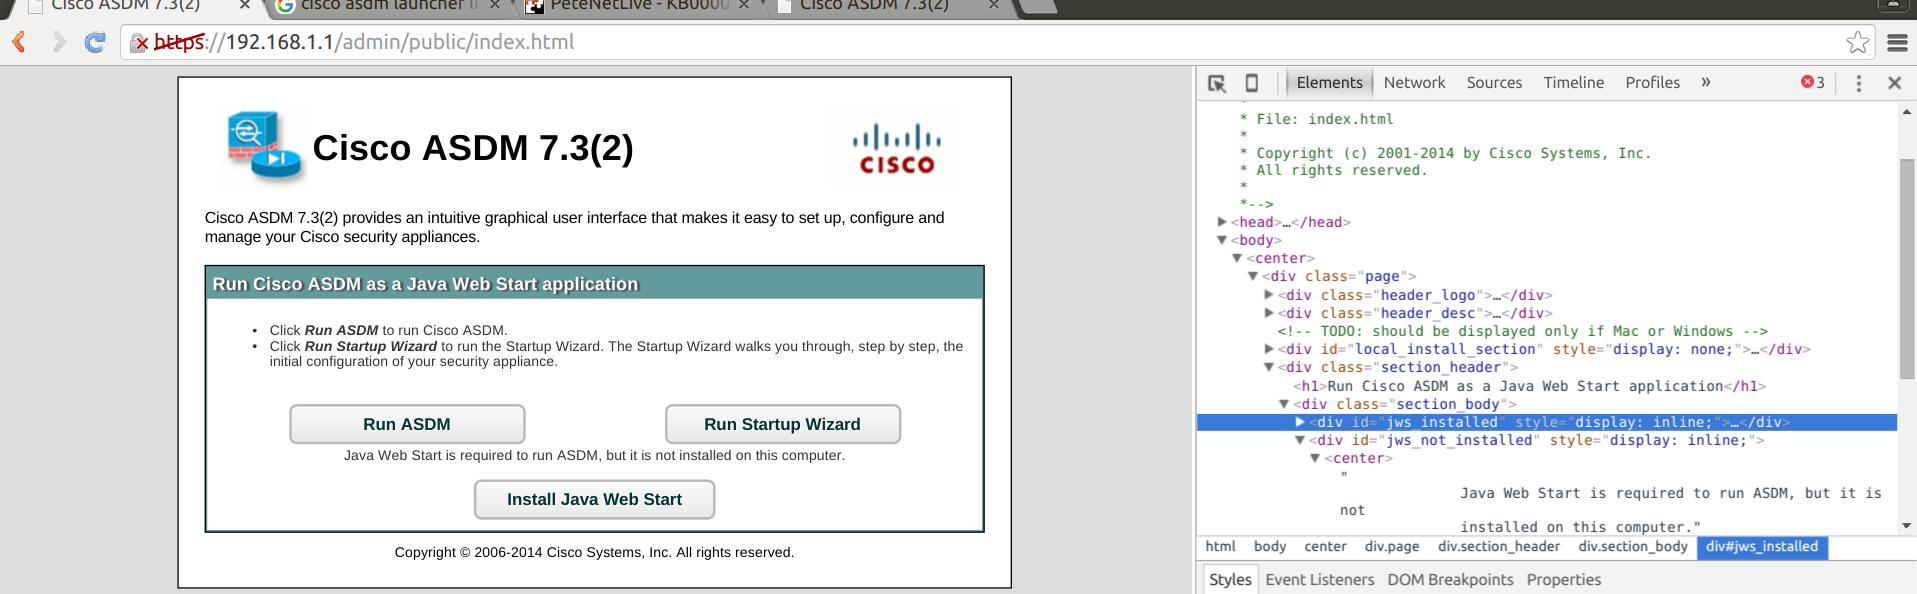 How to run Cisco ASDM as a Java Web Start application – Adventures